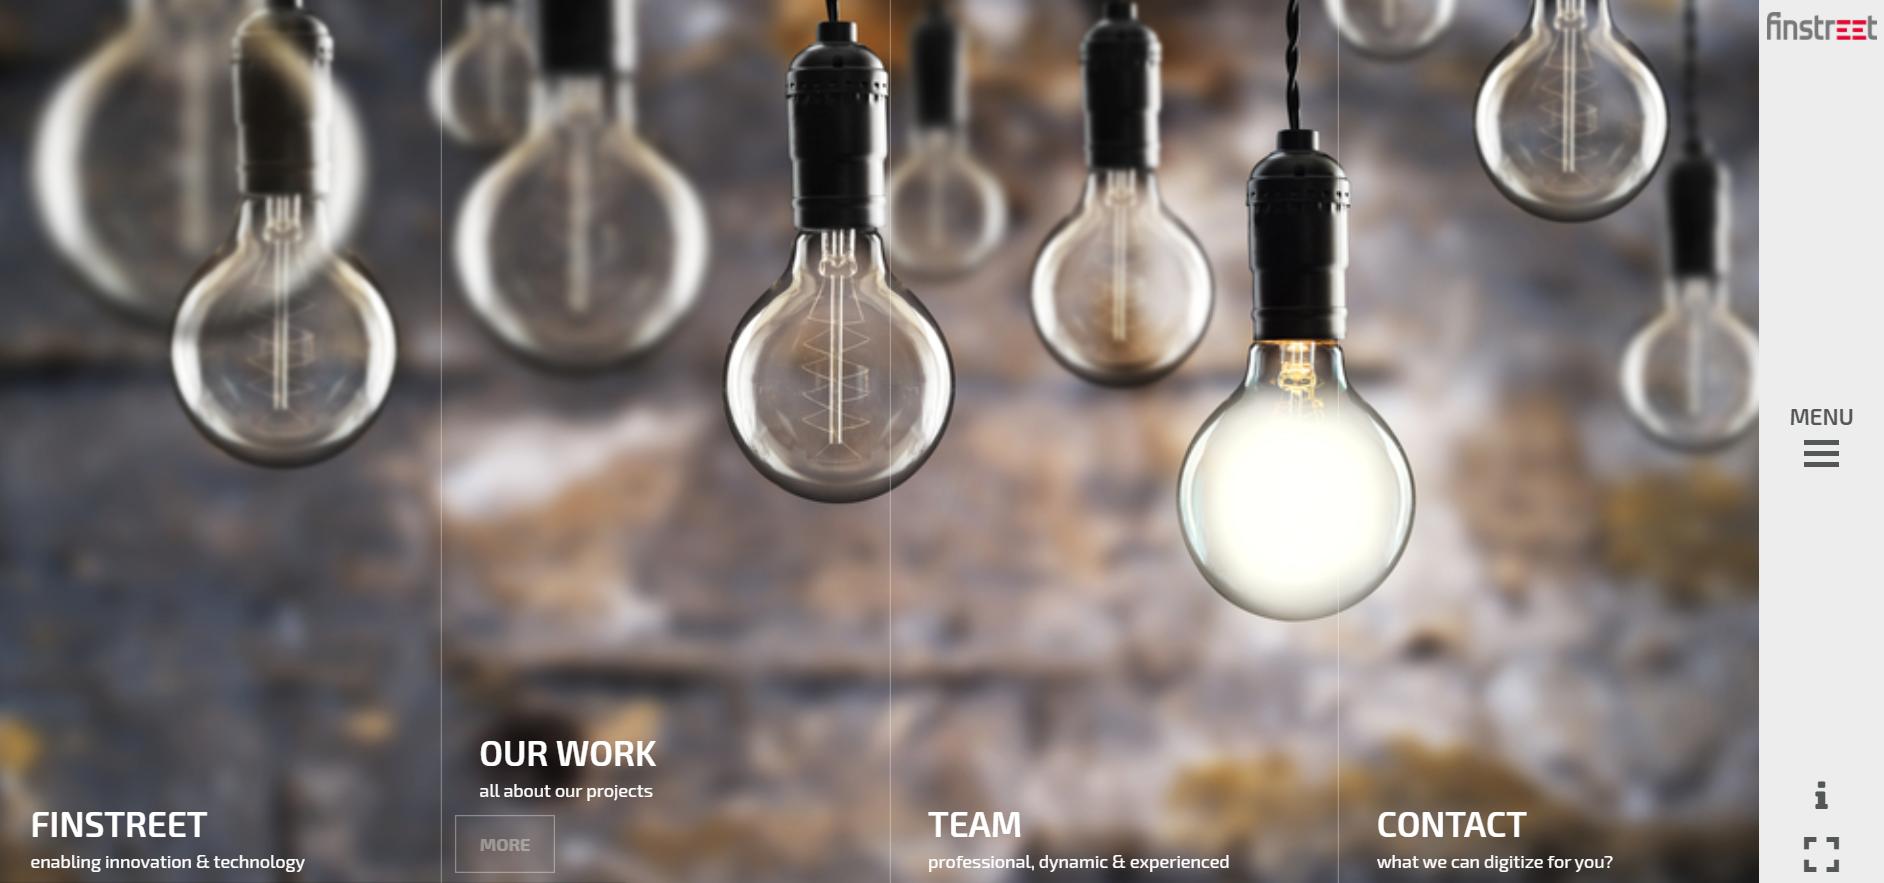 German Innovative Financial & Technology Solutions Platform - finstreet GmbH - Case Study